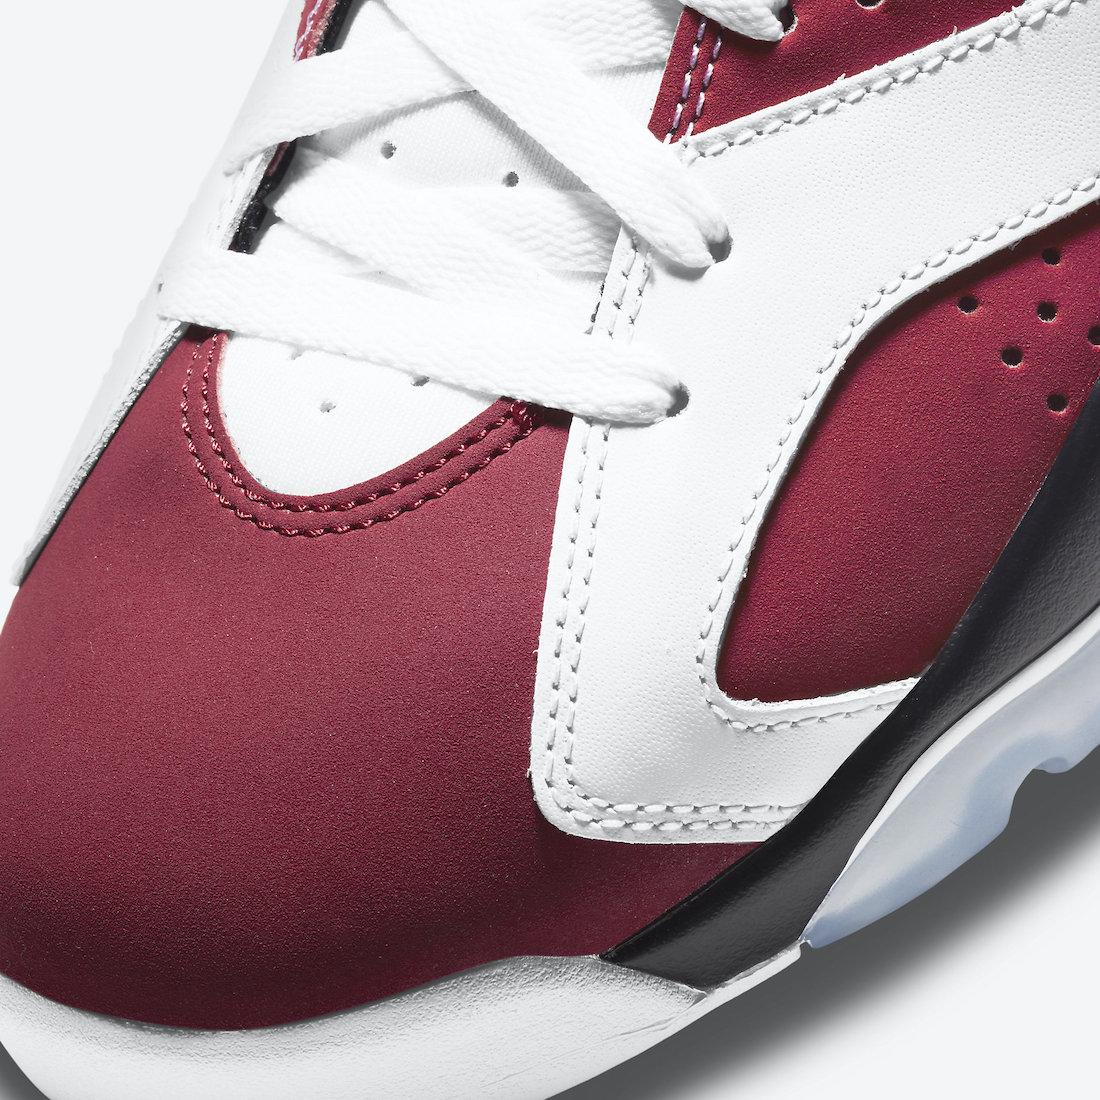 Air Jordan 6 Carmine CT8529-106 Release Date